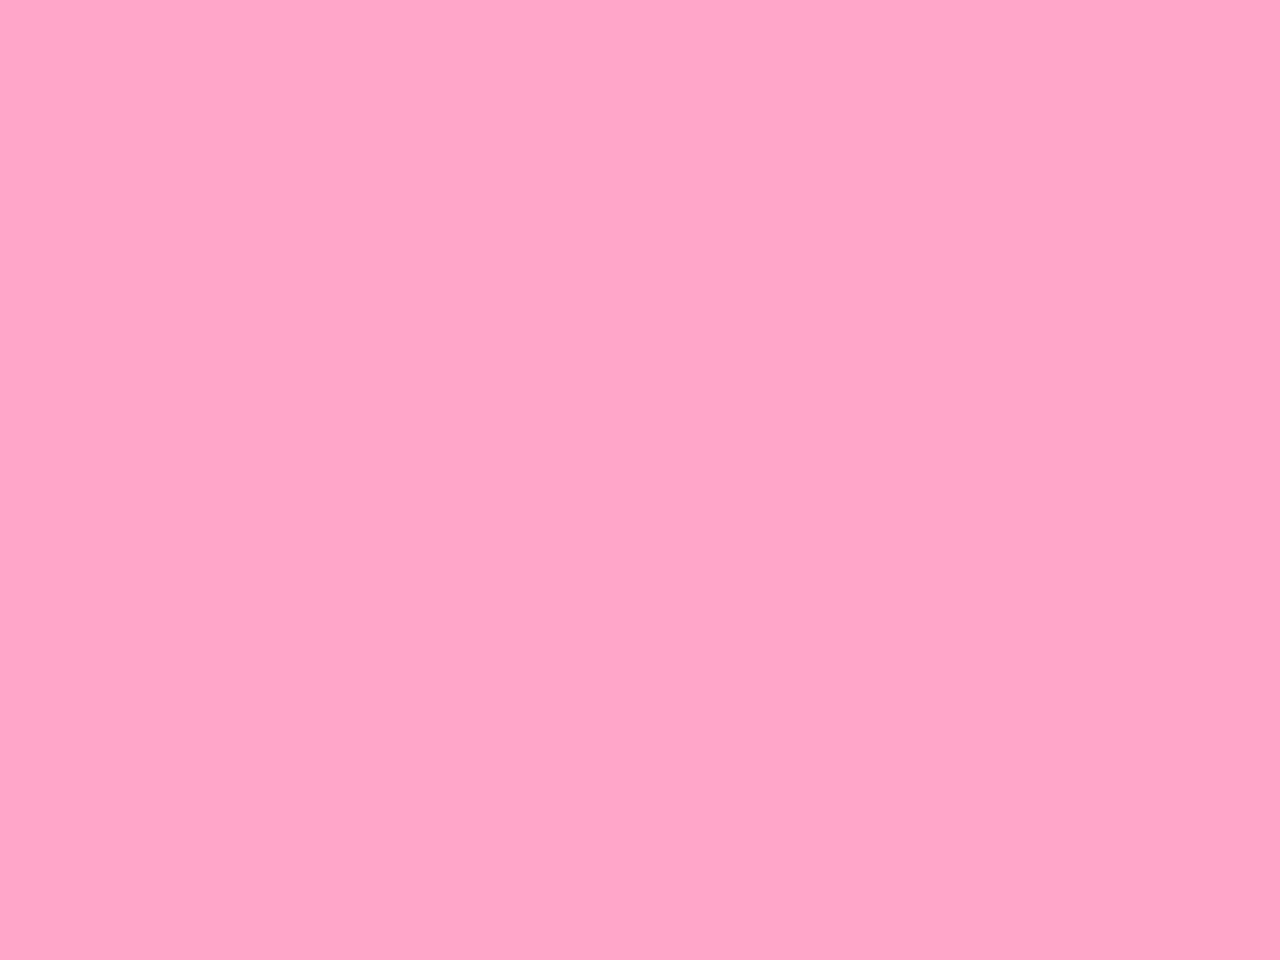 1280x960 Carnation Pink Solid Color Background